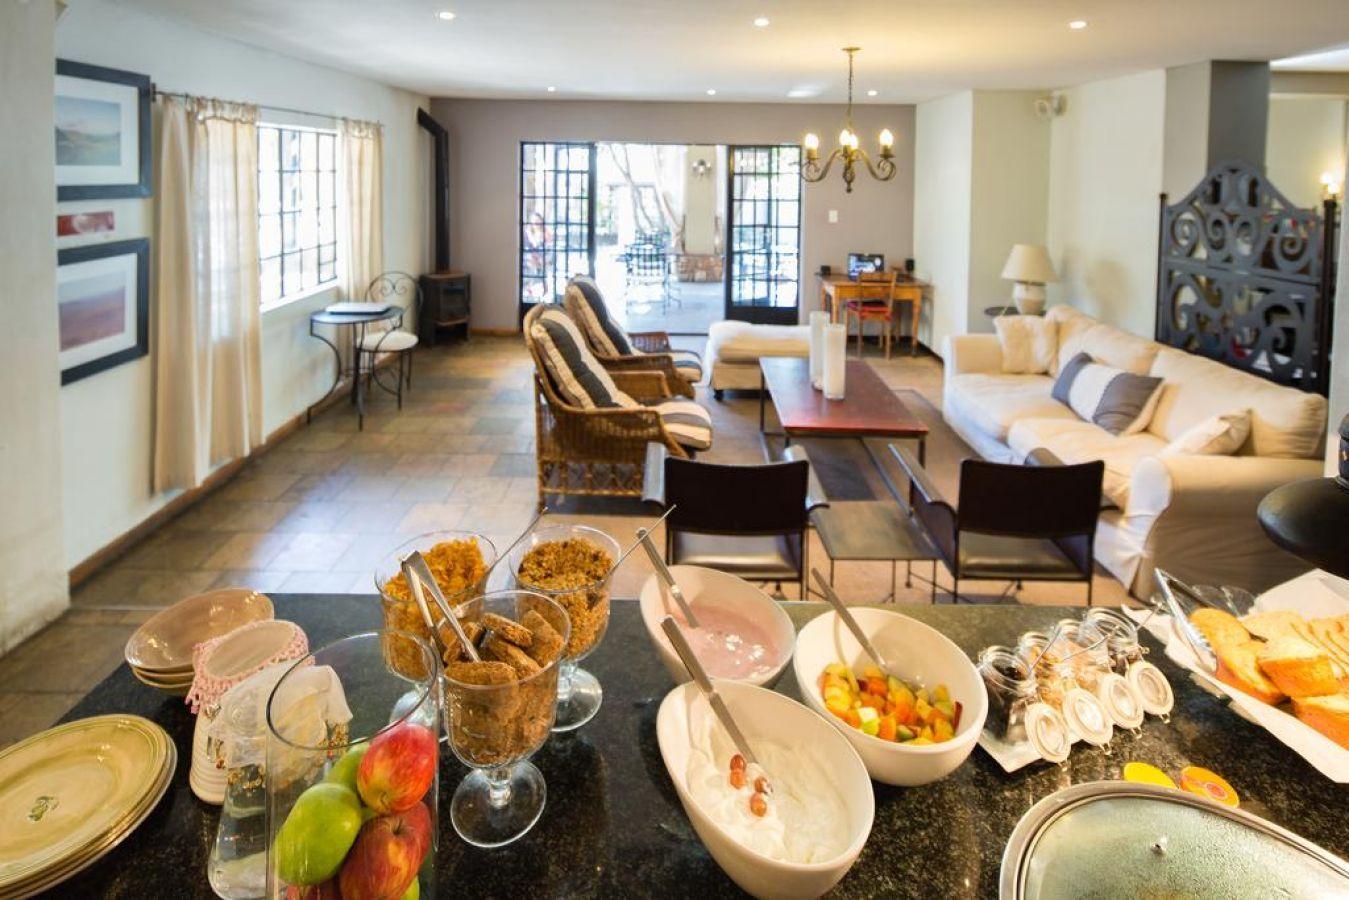 Olive Grove Guesthouse eetruimte